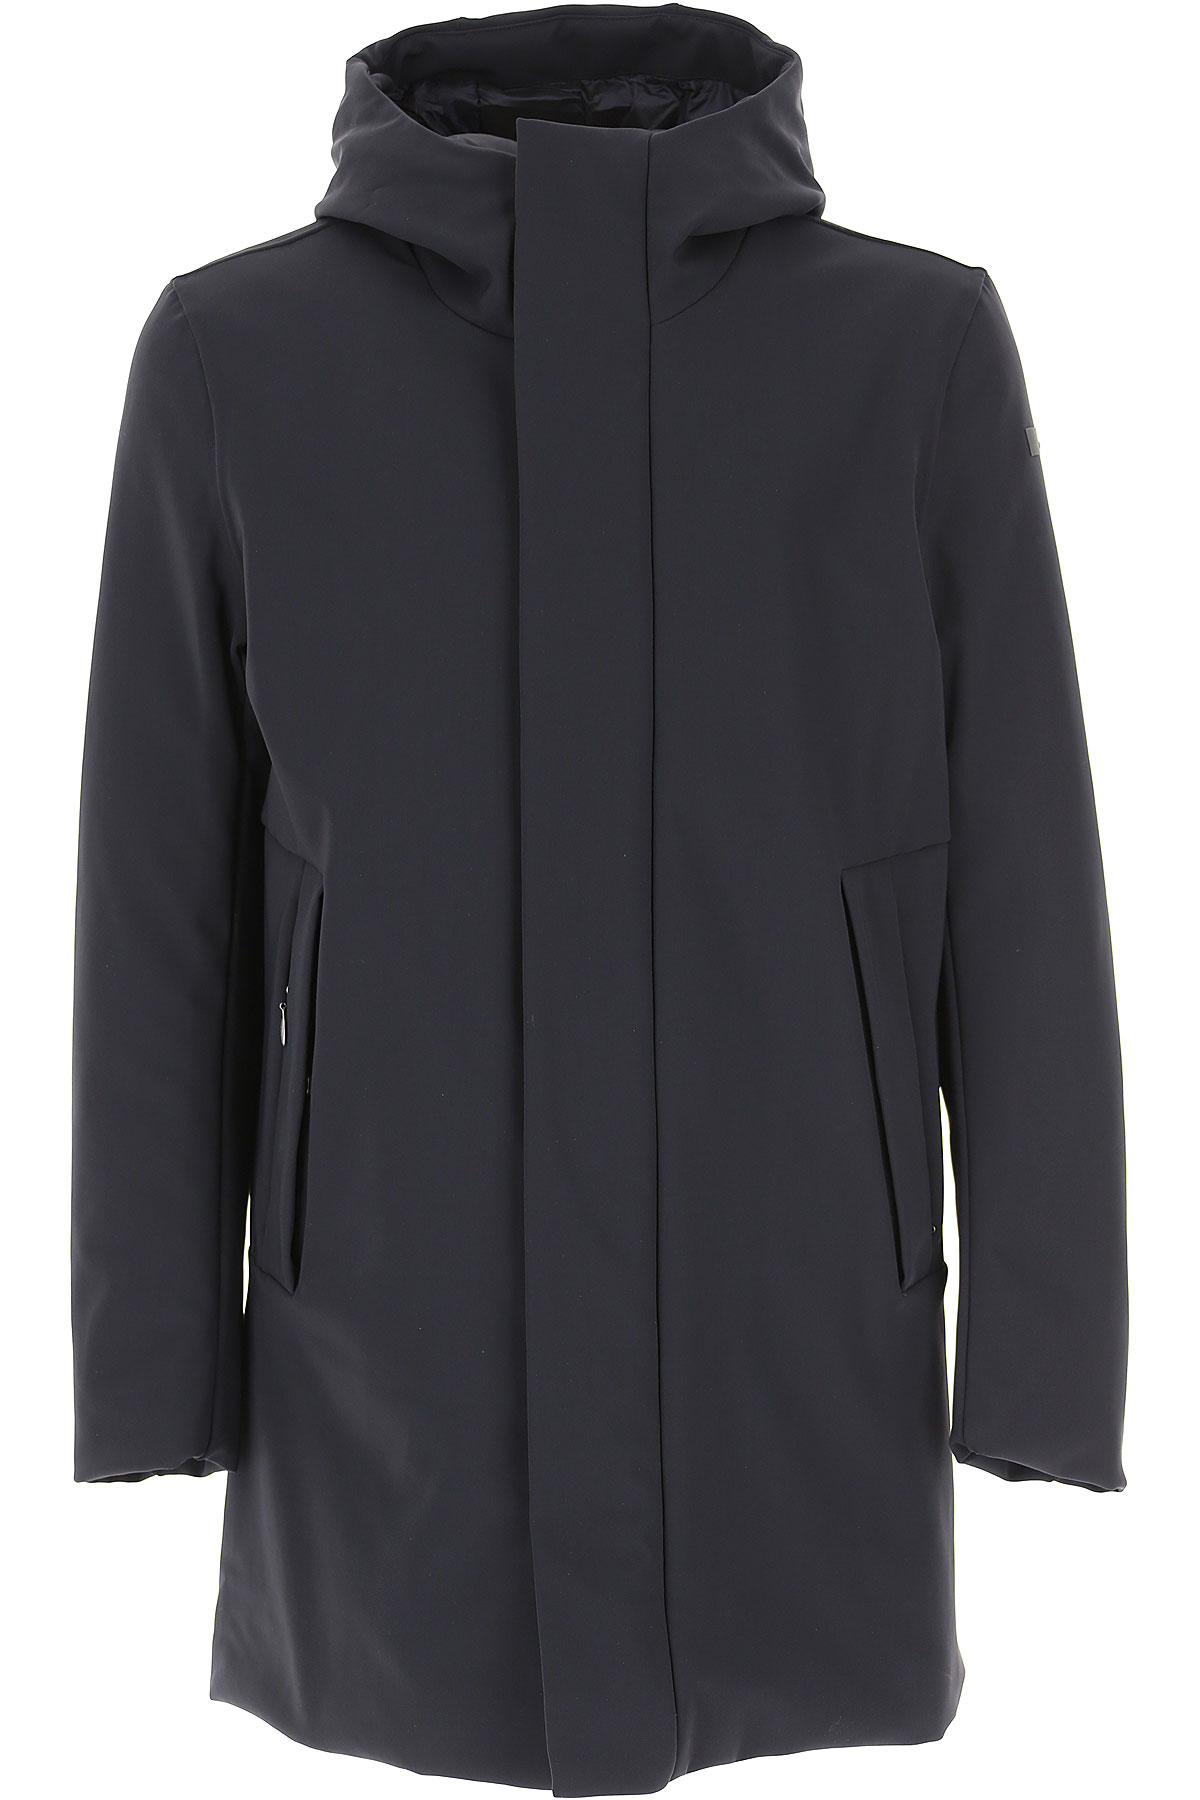 RRD Jacket for Men On Sale, Midnight Blue, polyamide, 2019, L M S XL XXL XXXL